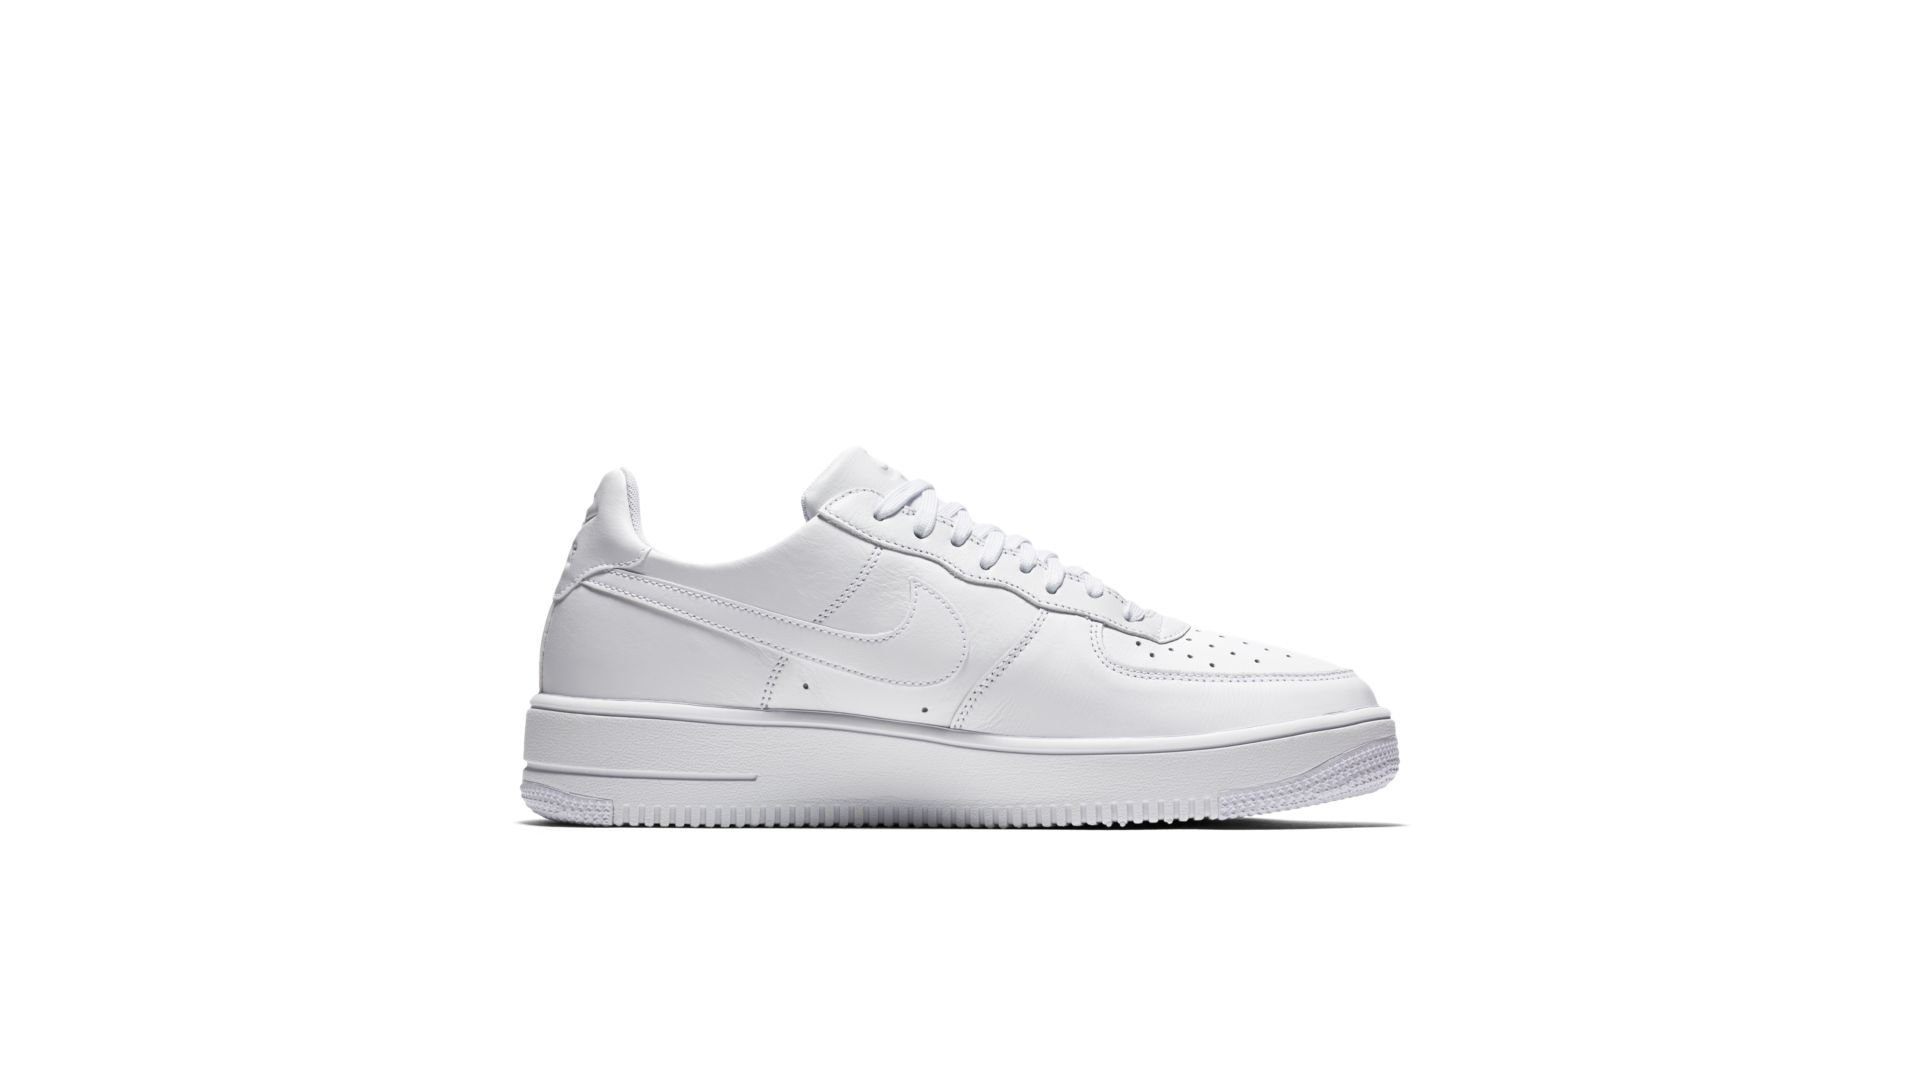 Air Force 1 Ultraforce Low Triple White